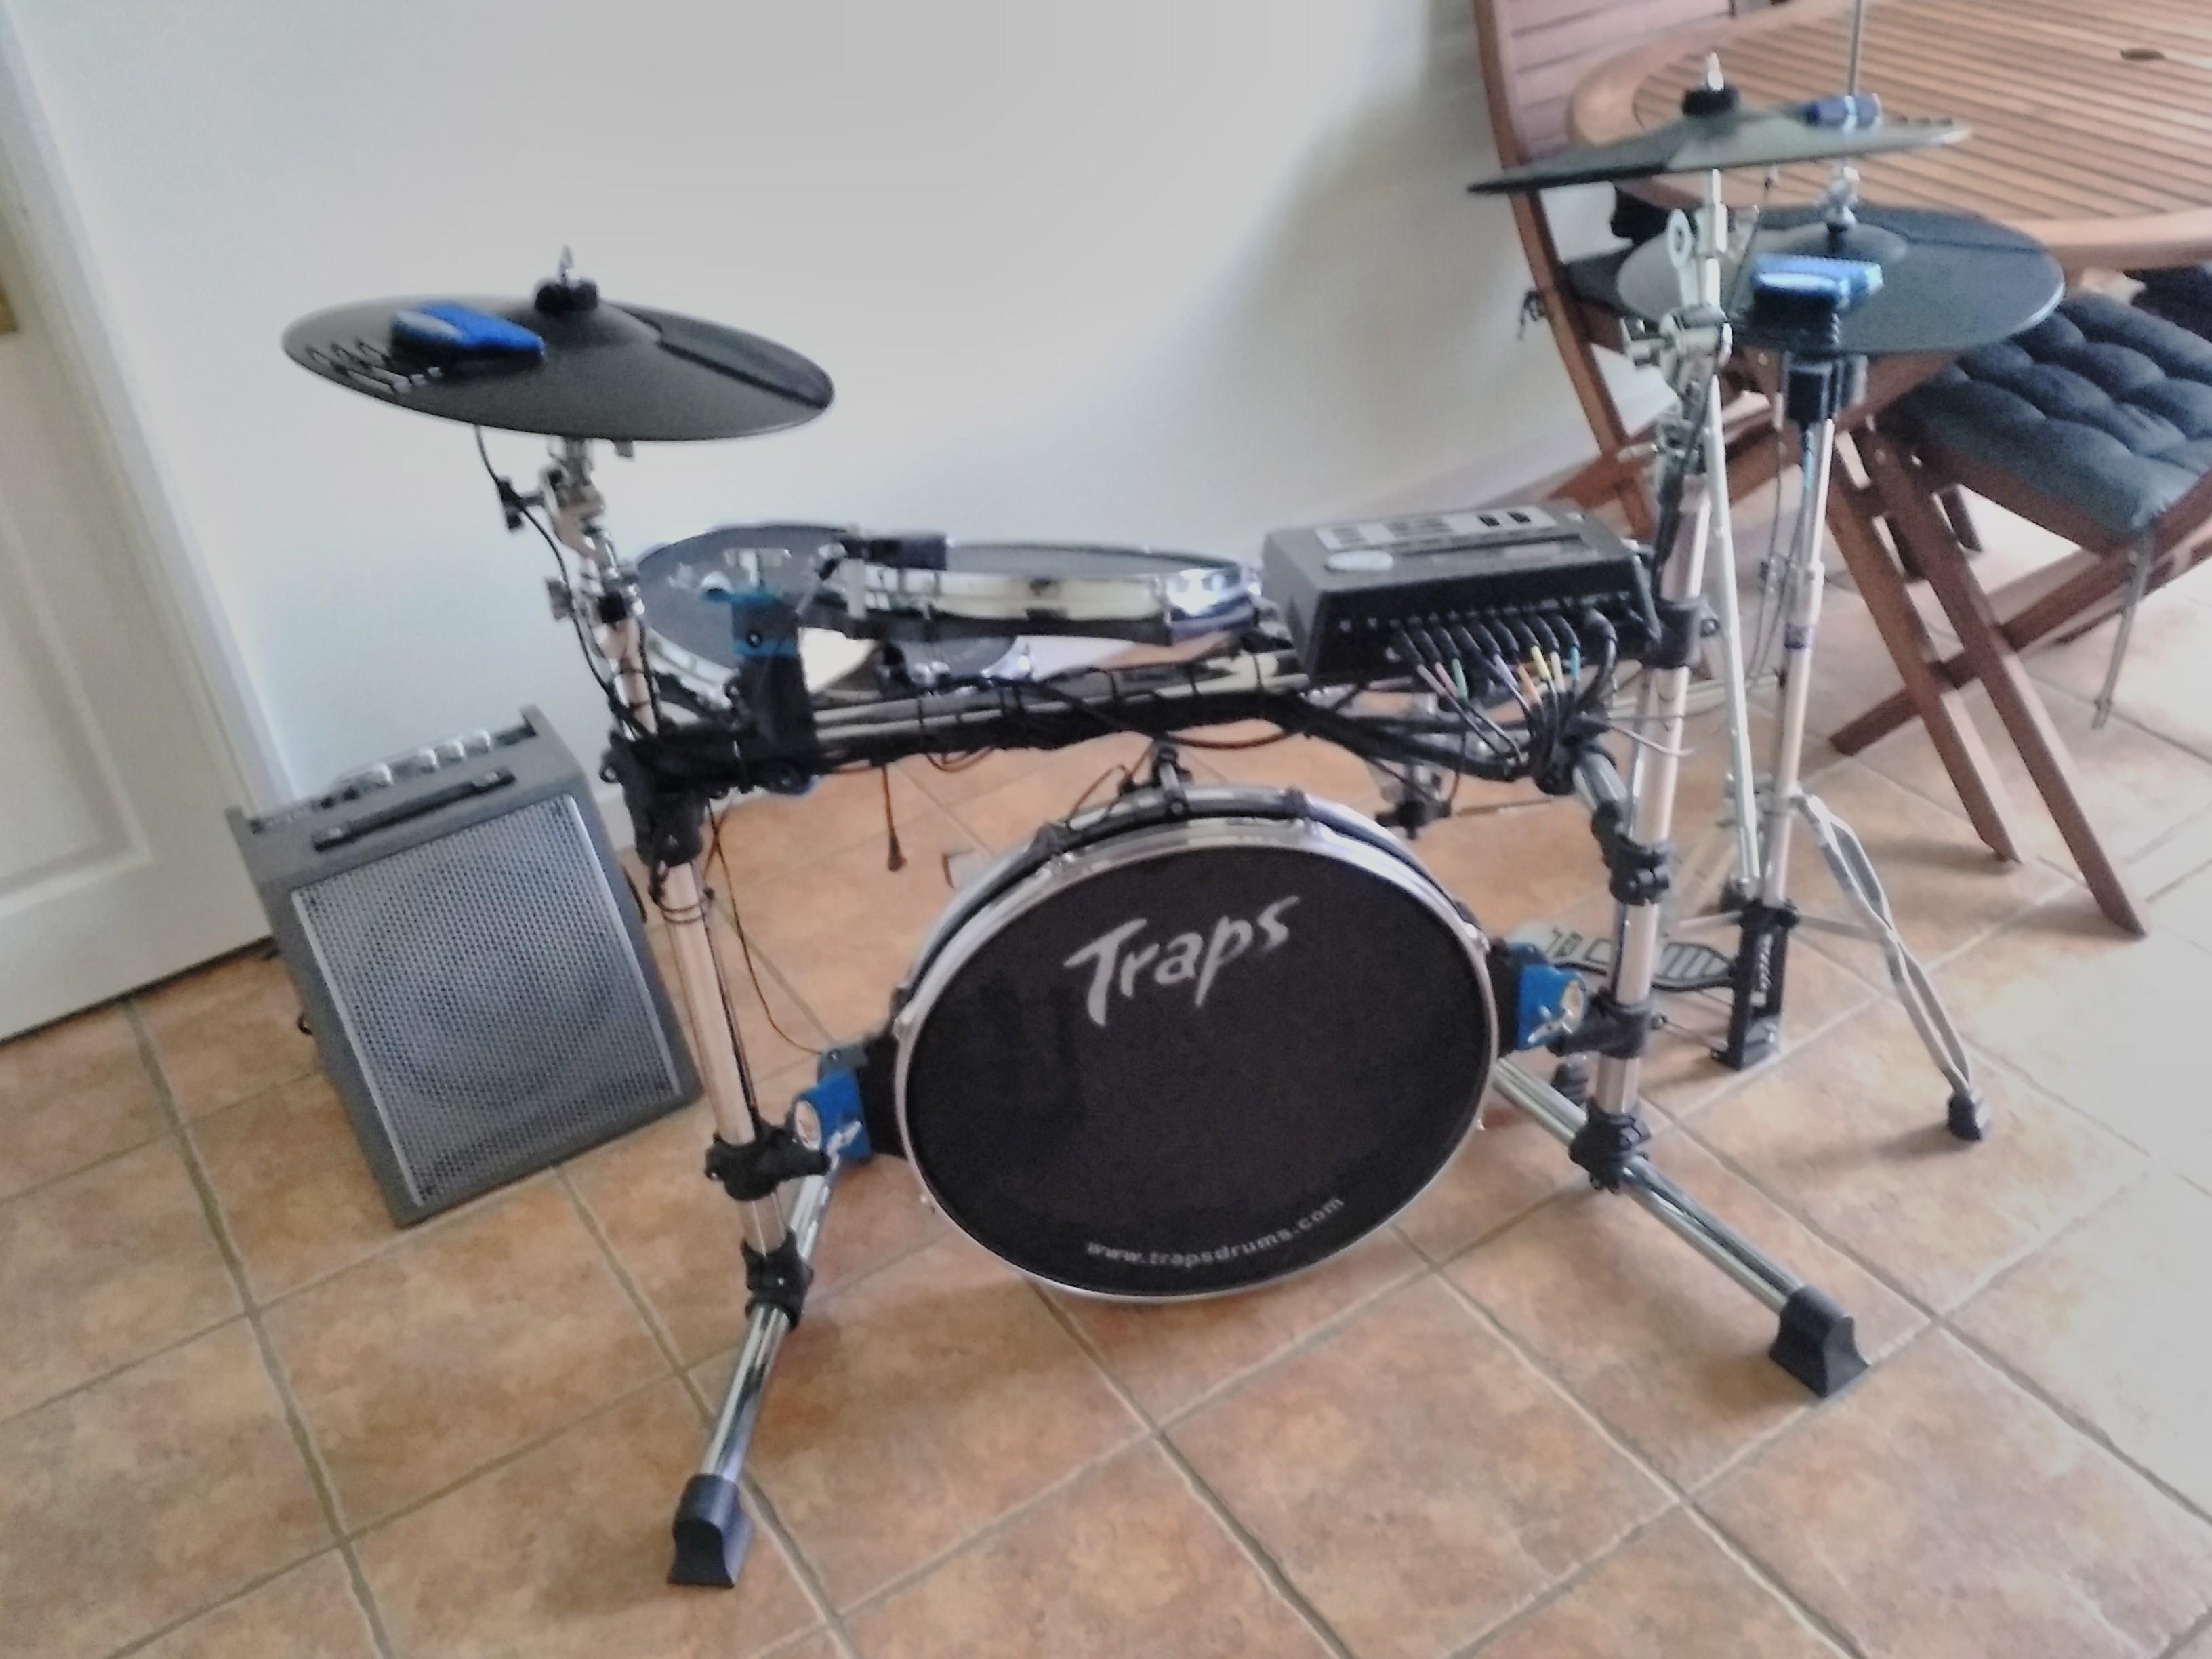 Traps electric drum set.